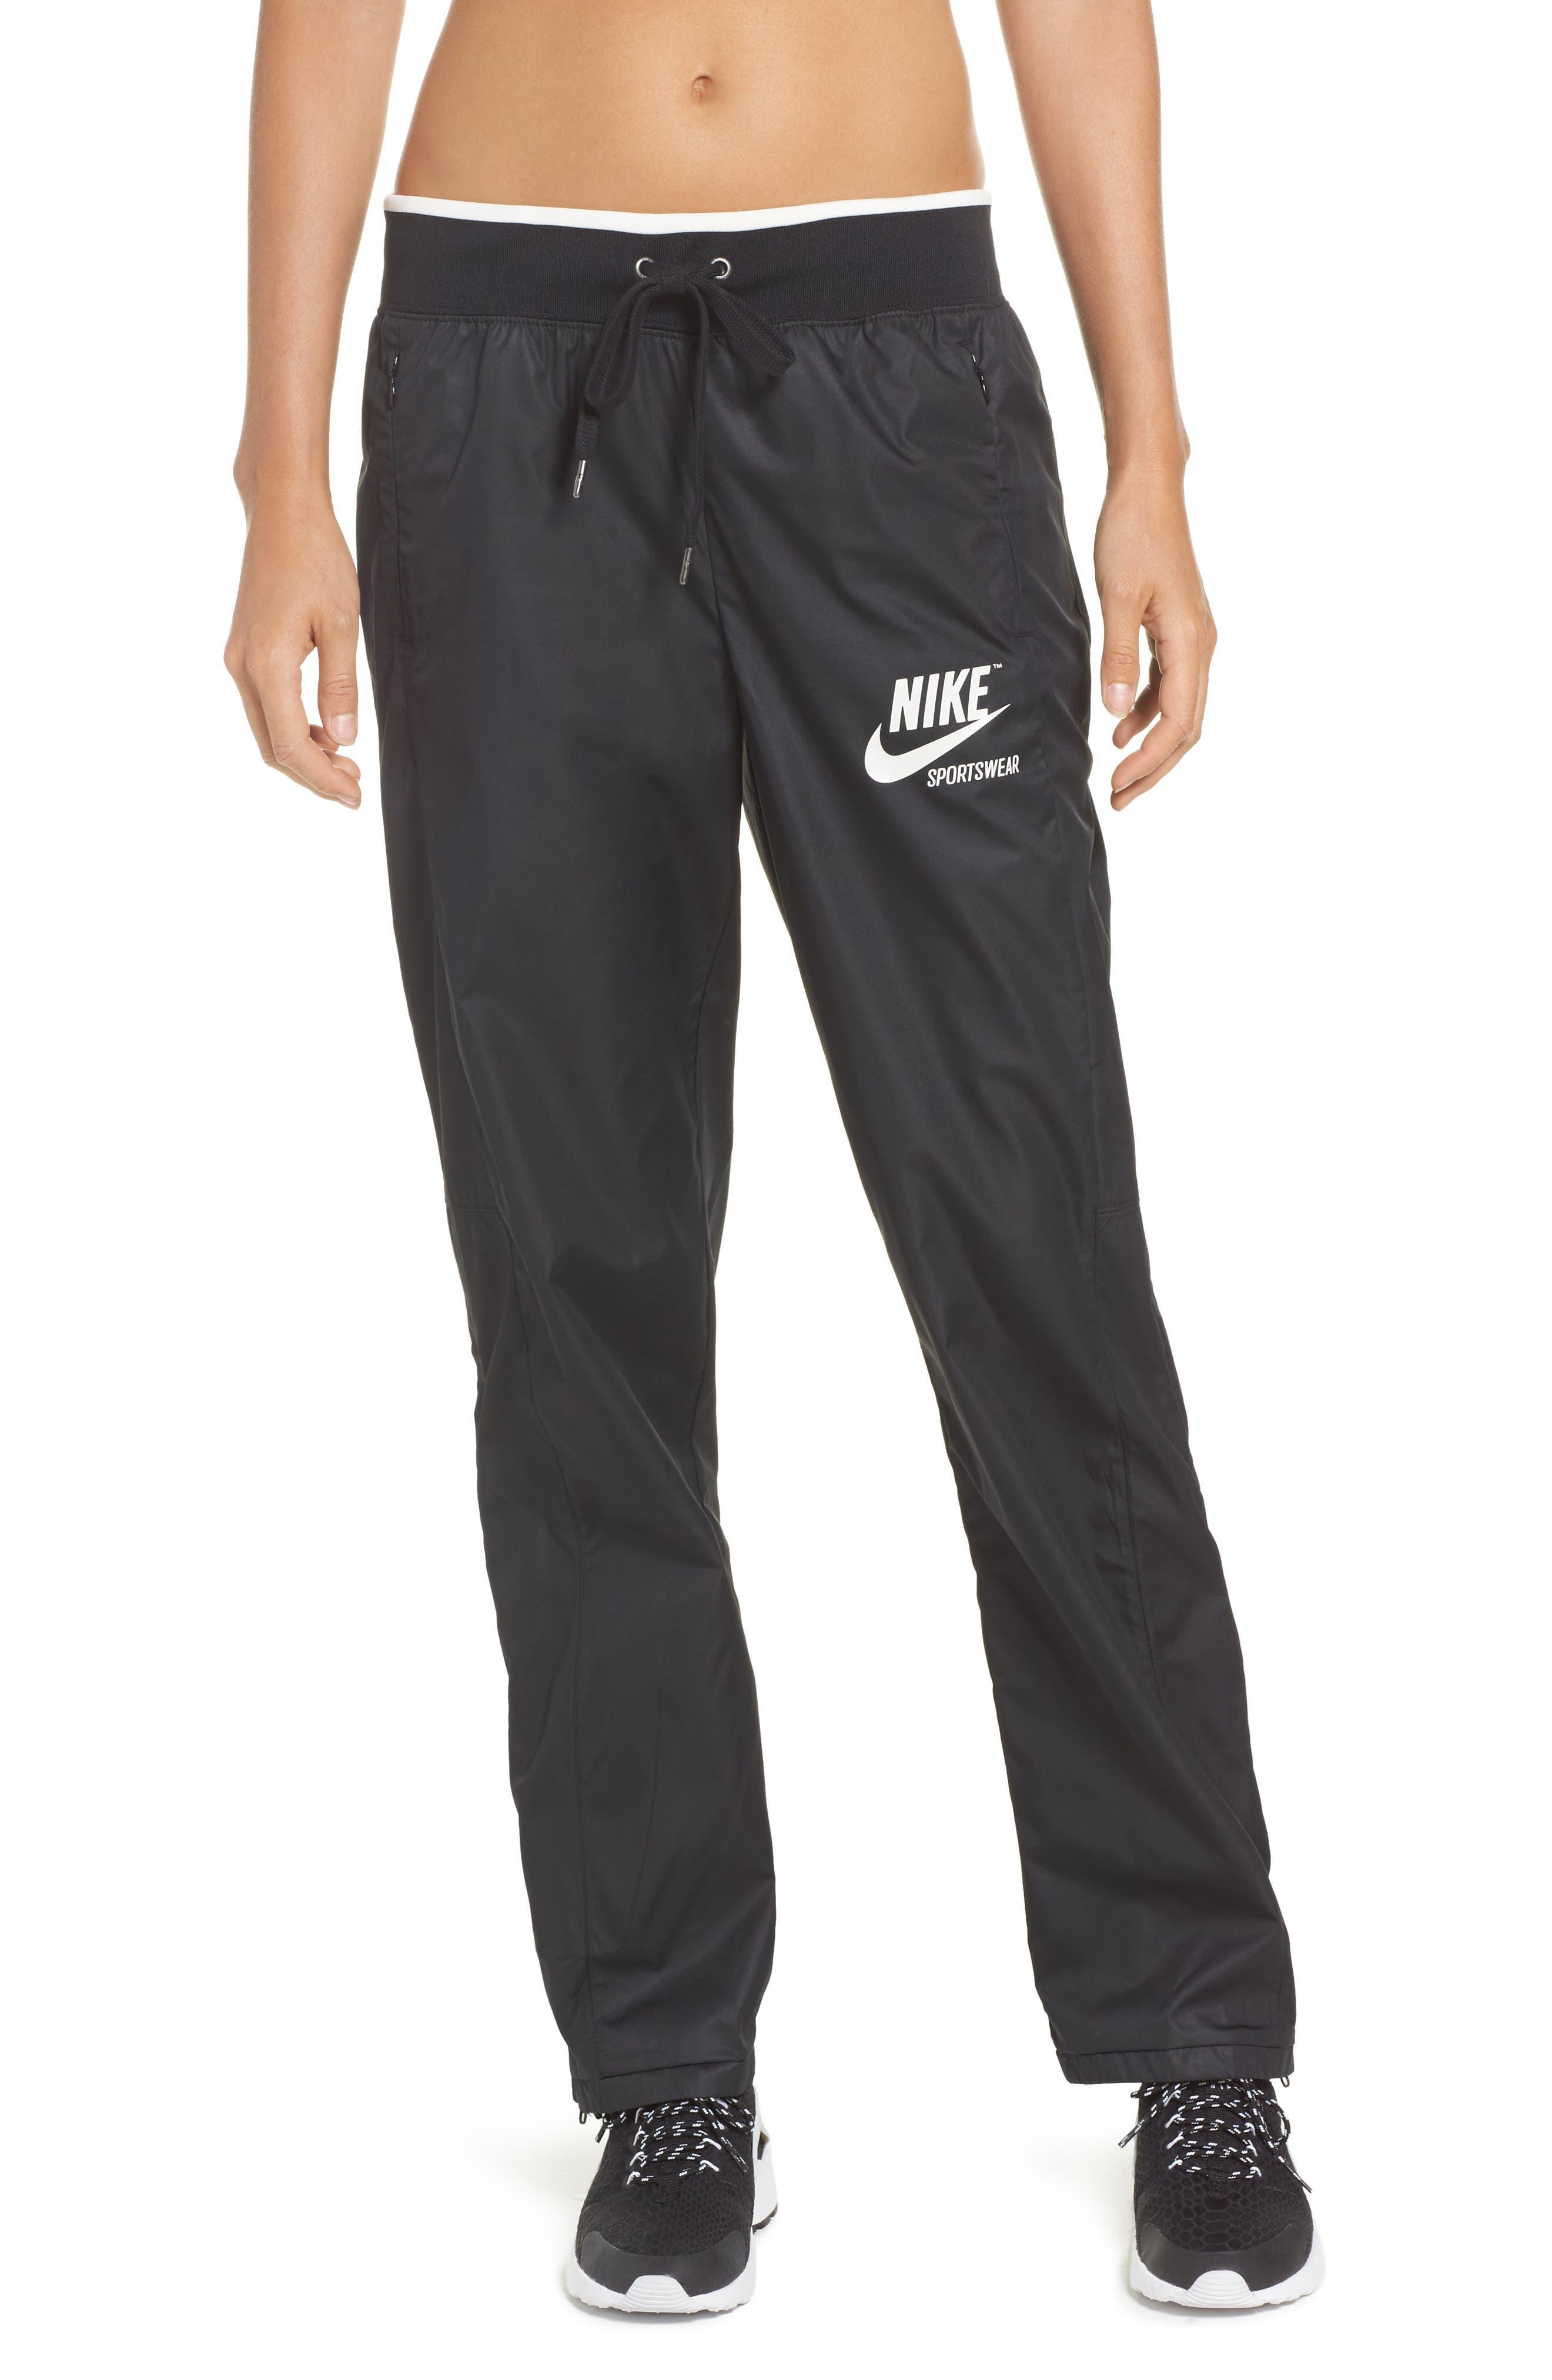 Nike Archive Drawstring Track Pants